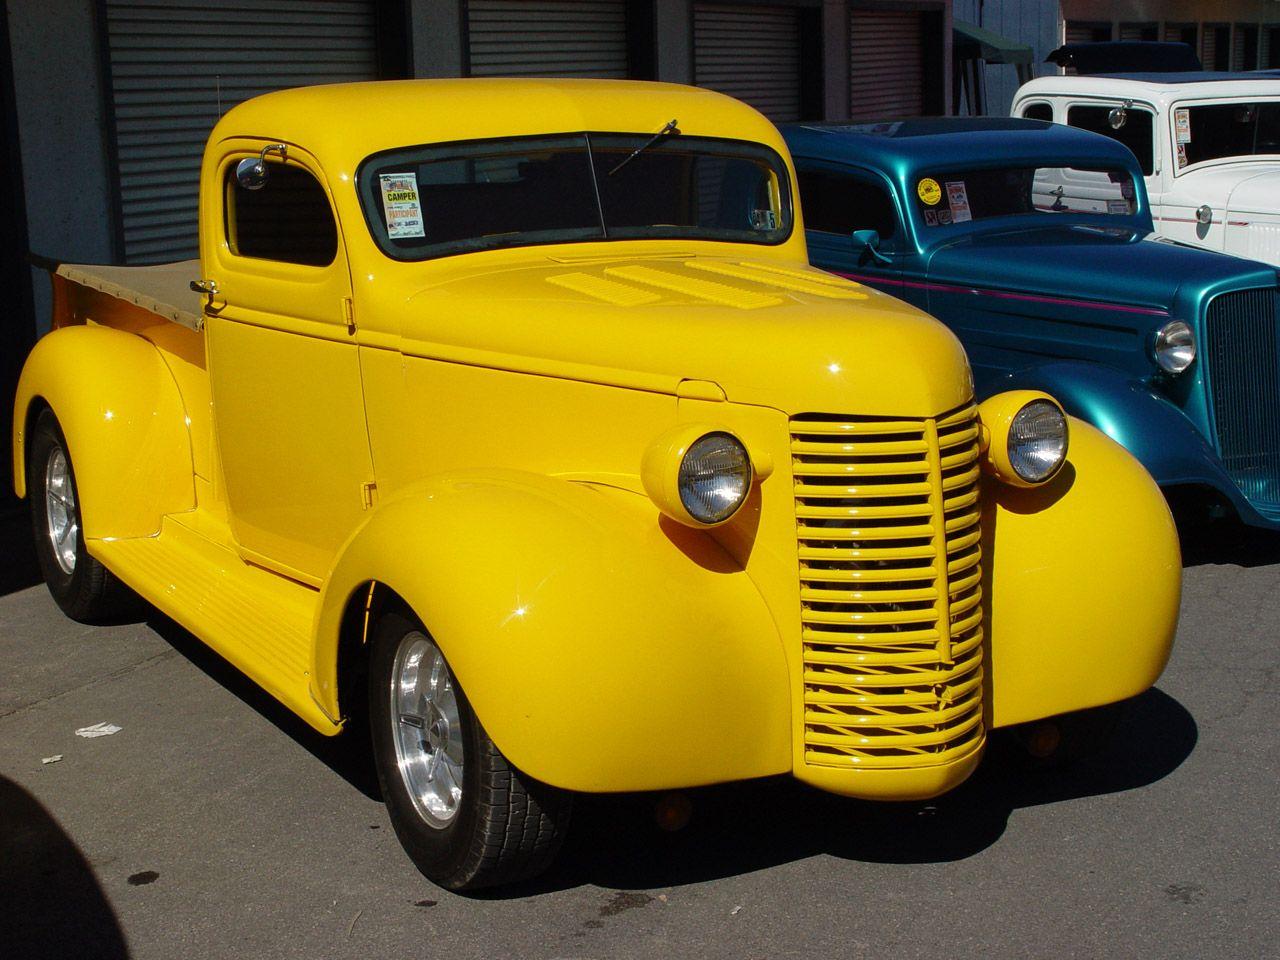 http://www.seriouswheels.com/pics-1930-1939/1939-Chevrolet-Pickup ...